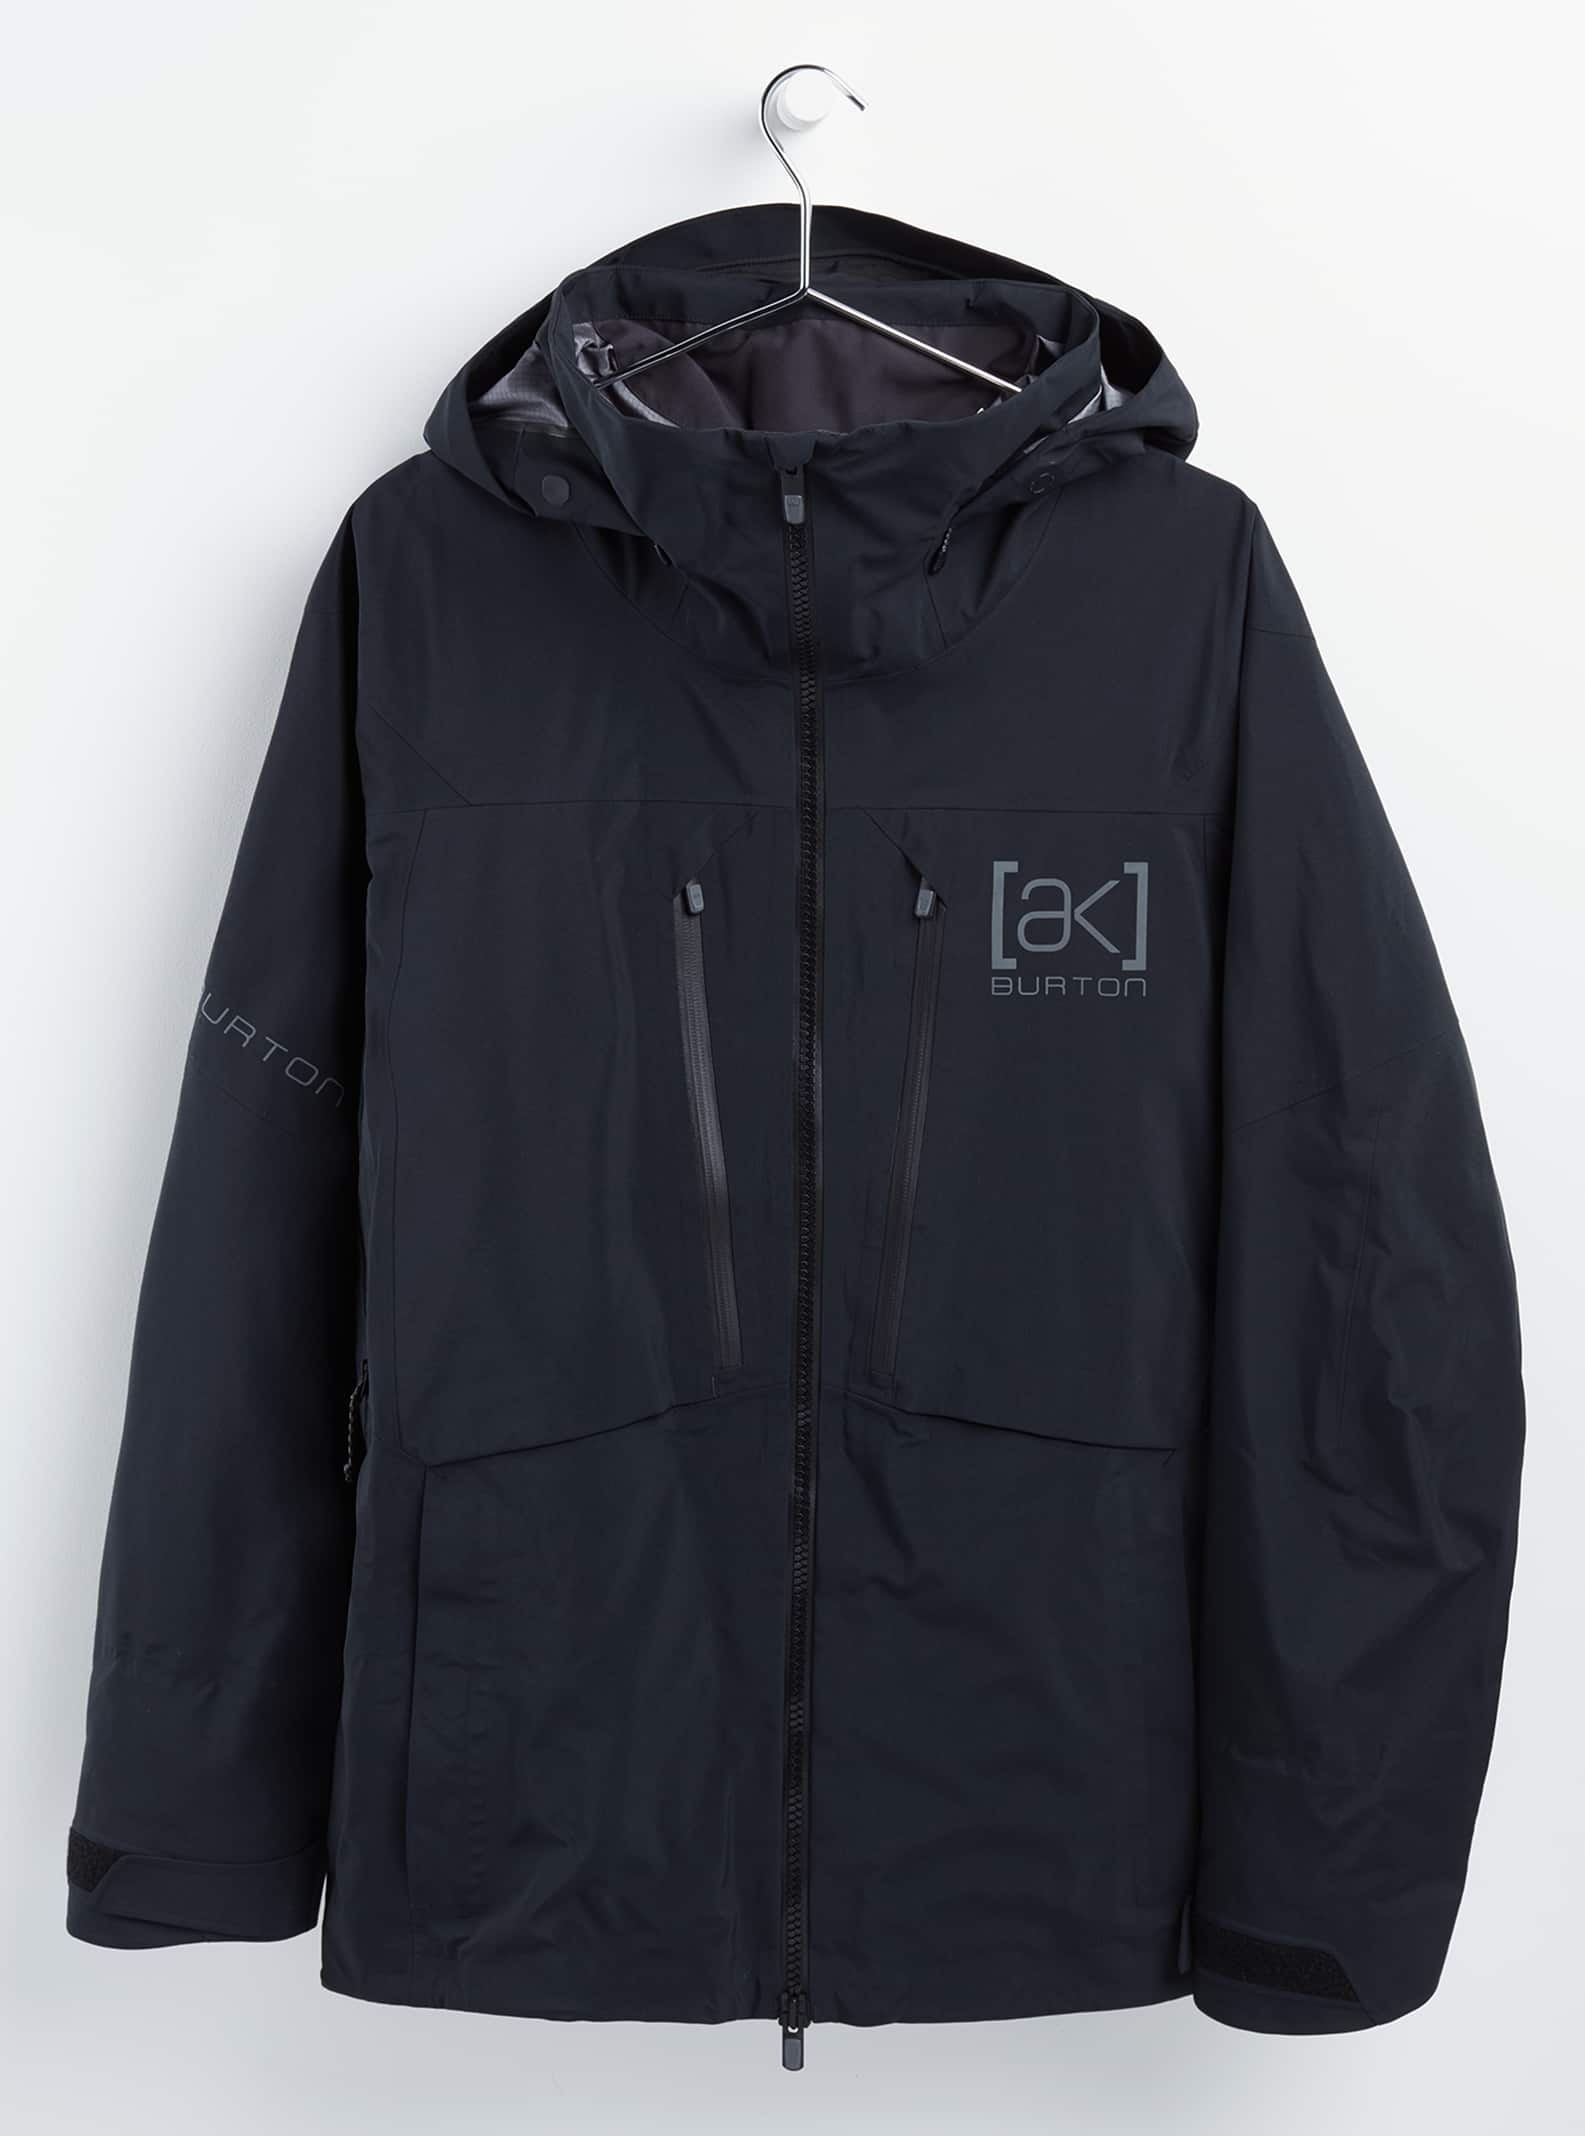 Burton [ak] GORETEX 3L Pro Hover-jacka för herrar, True Black, XL